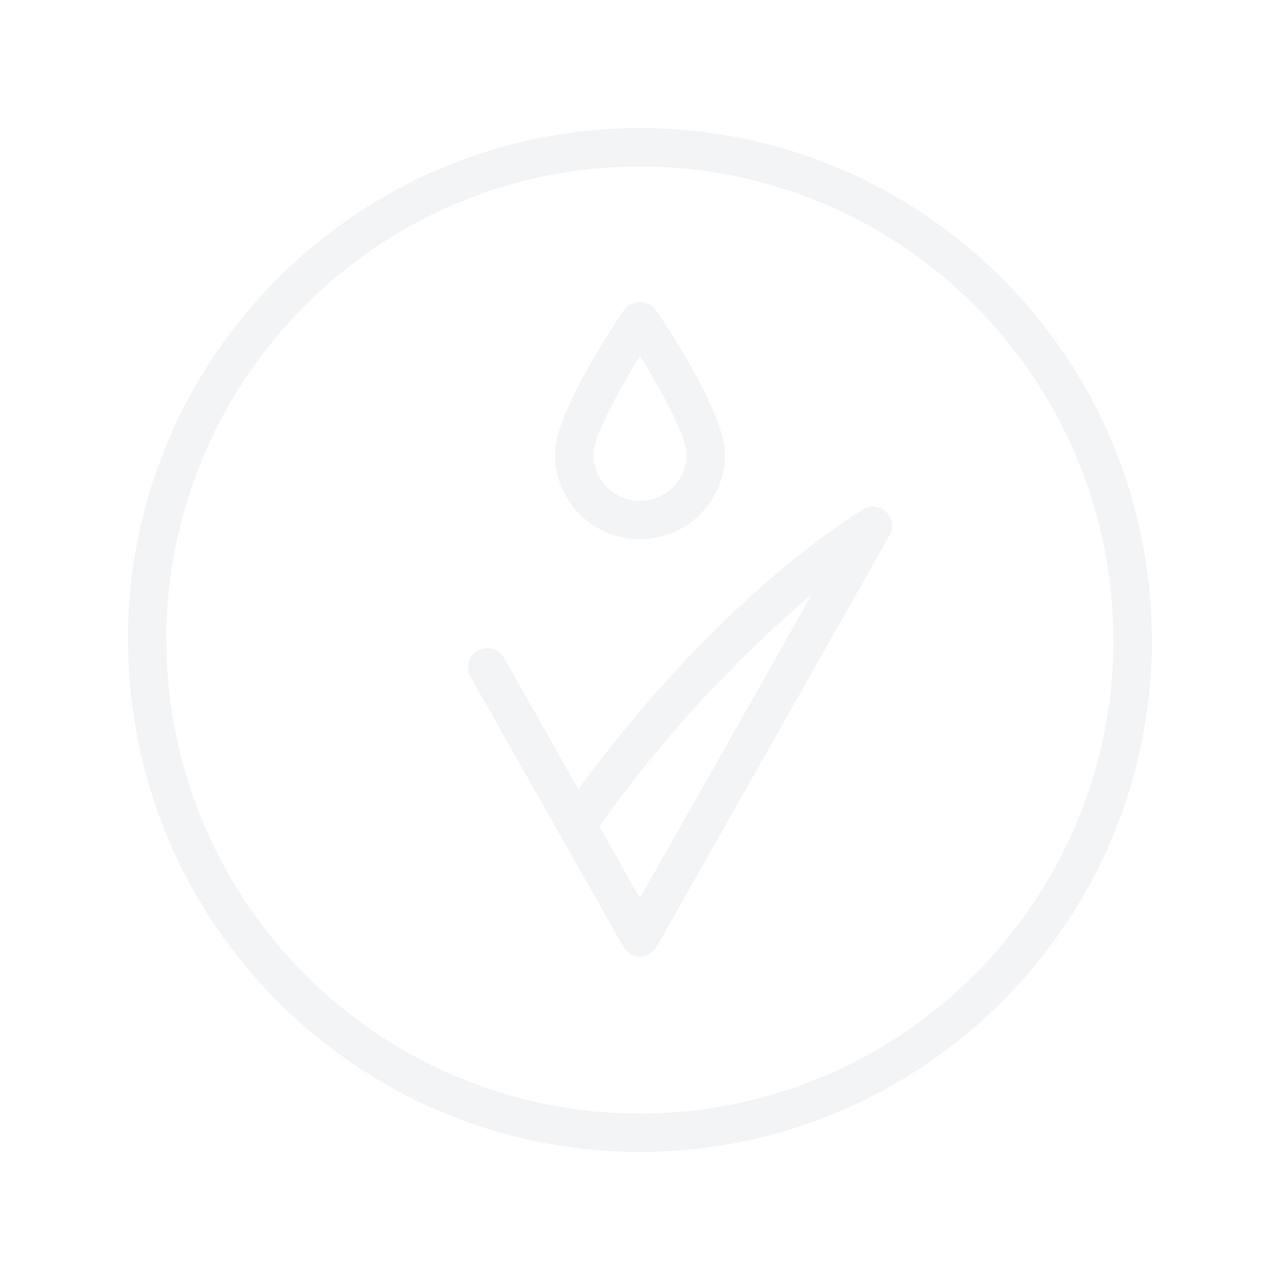 LUMENE Nordic Chic Loose Powder Translucent 8g